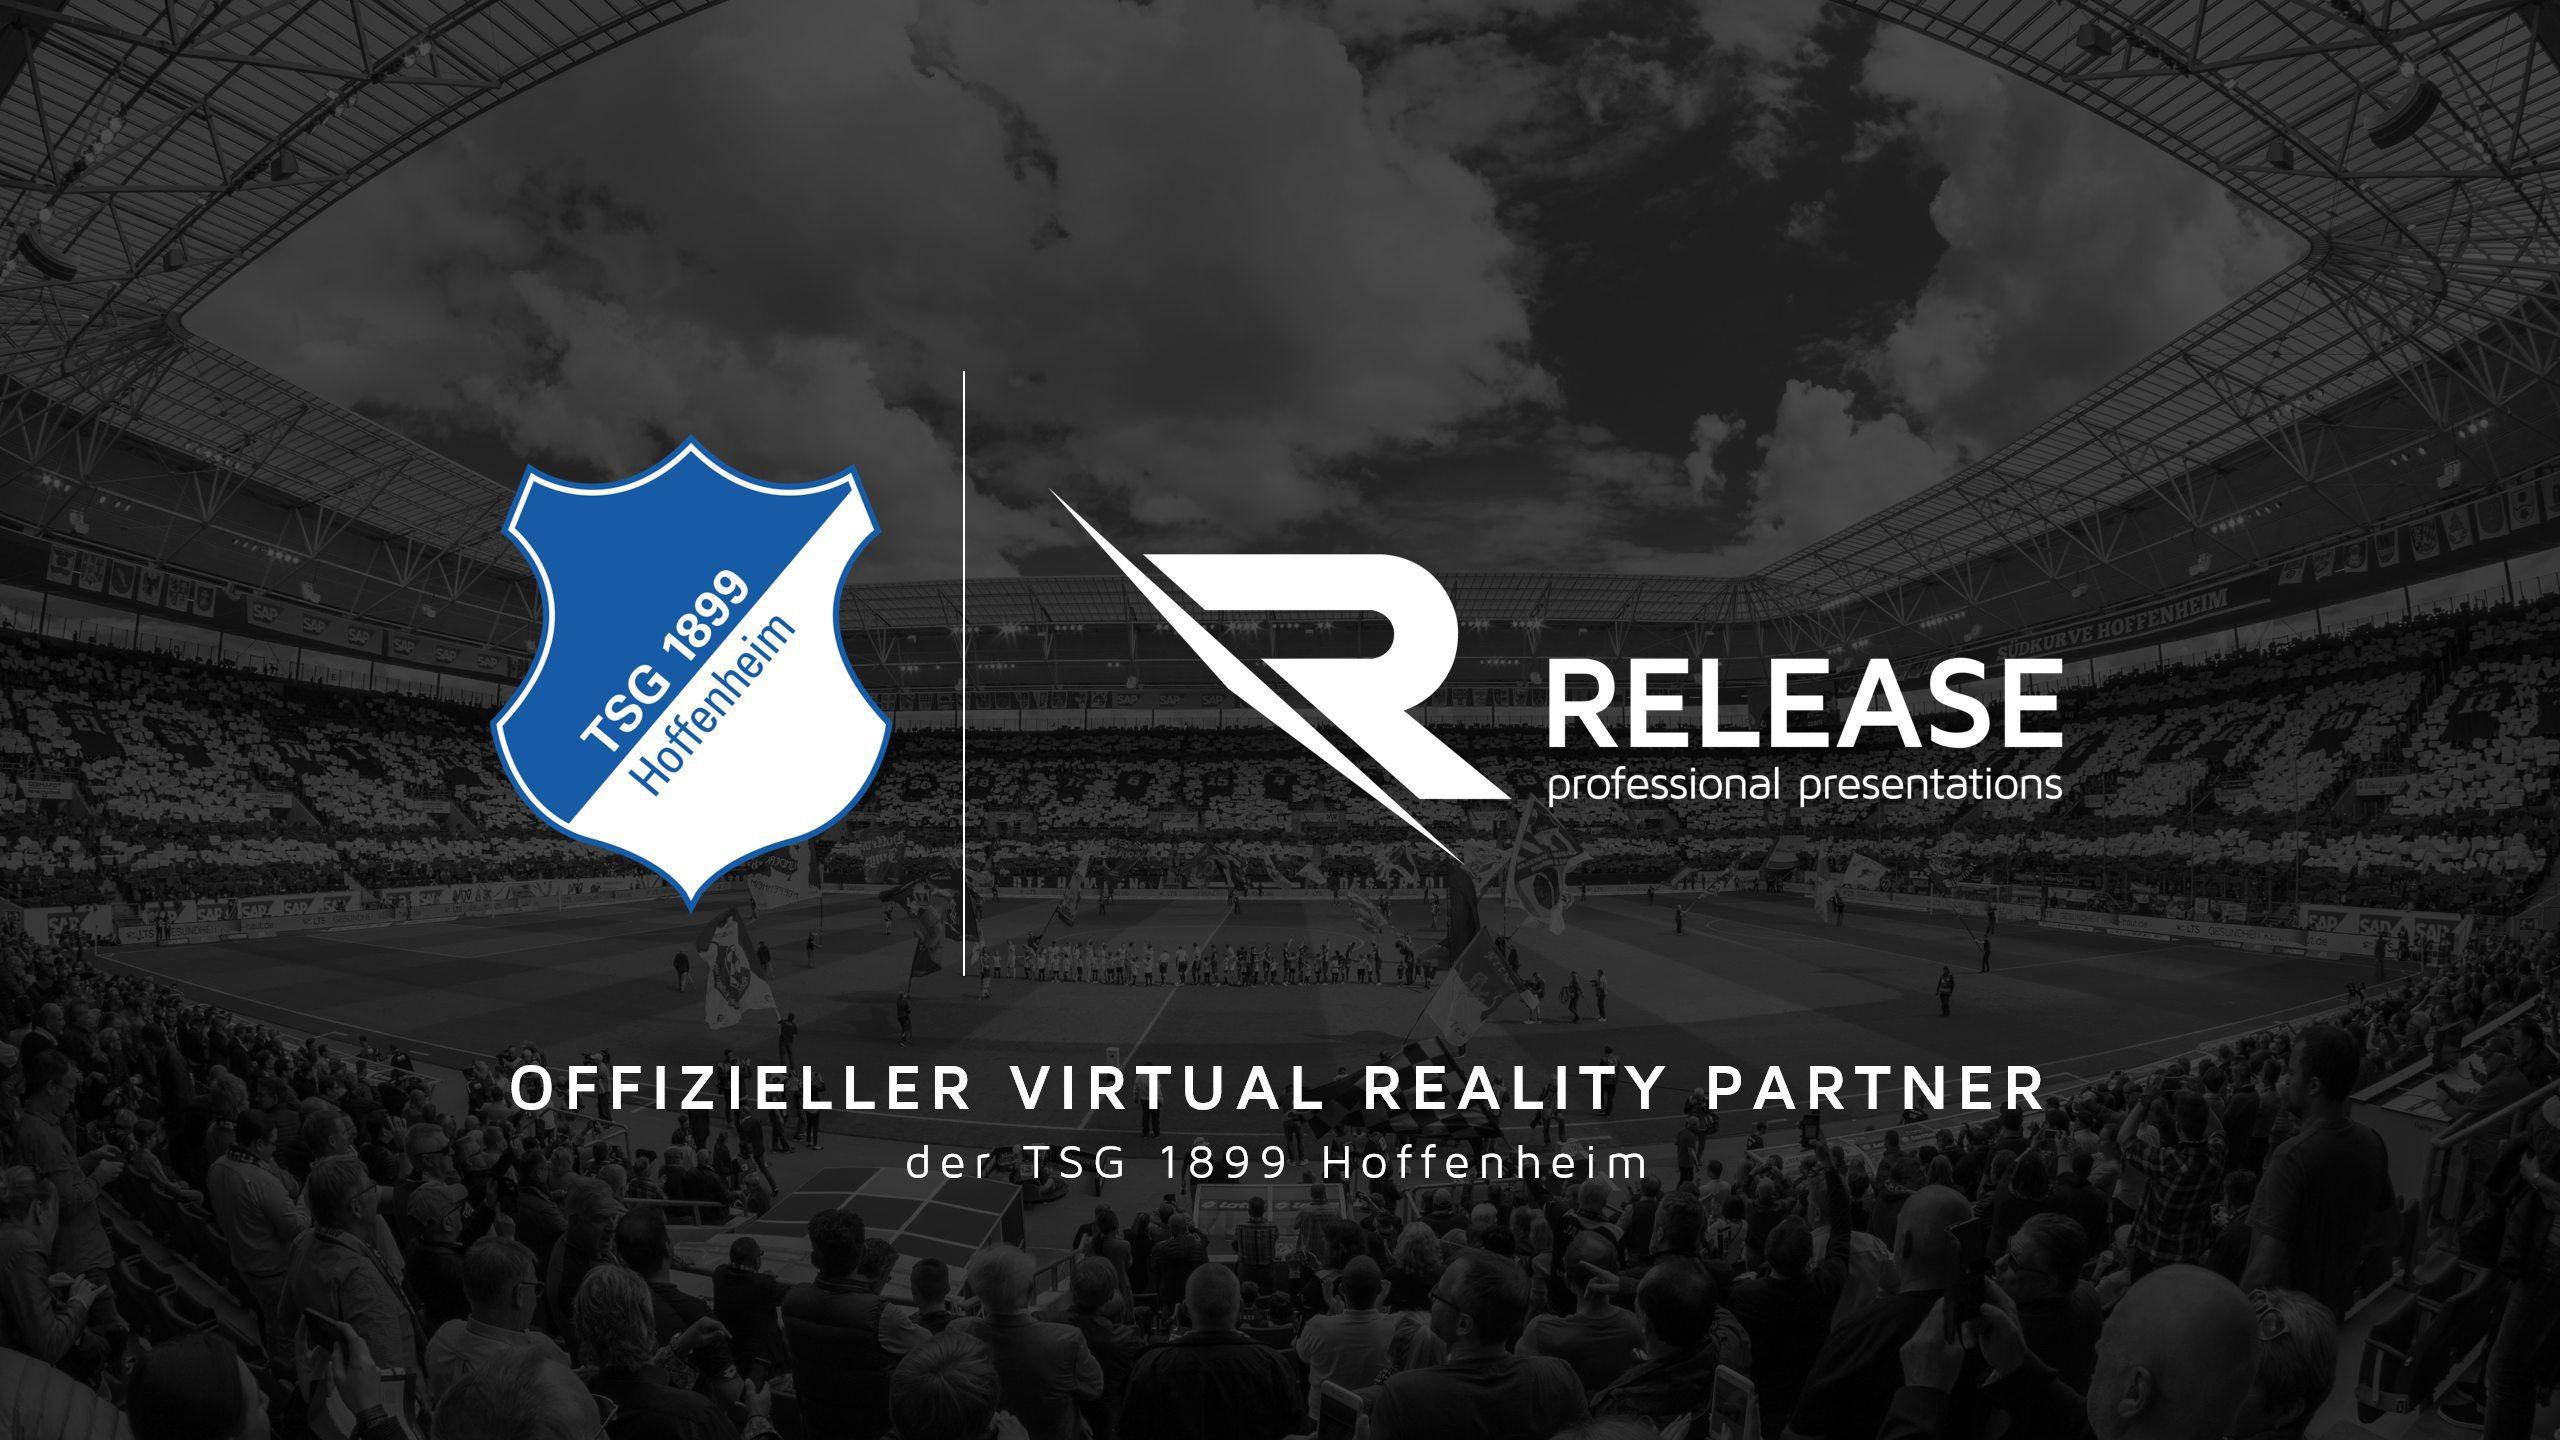 RELEASE ist der erste Virtual Reality Partner der Fußball Bundesliga